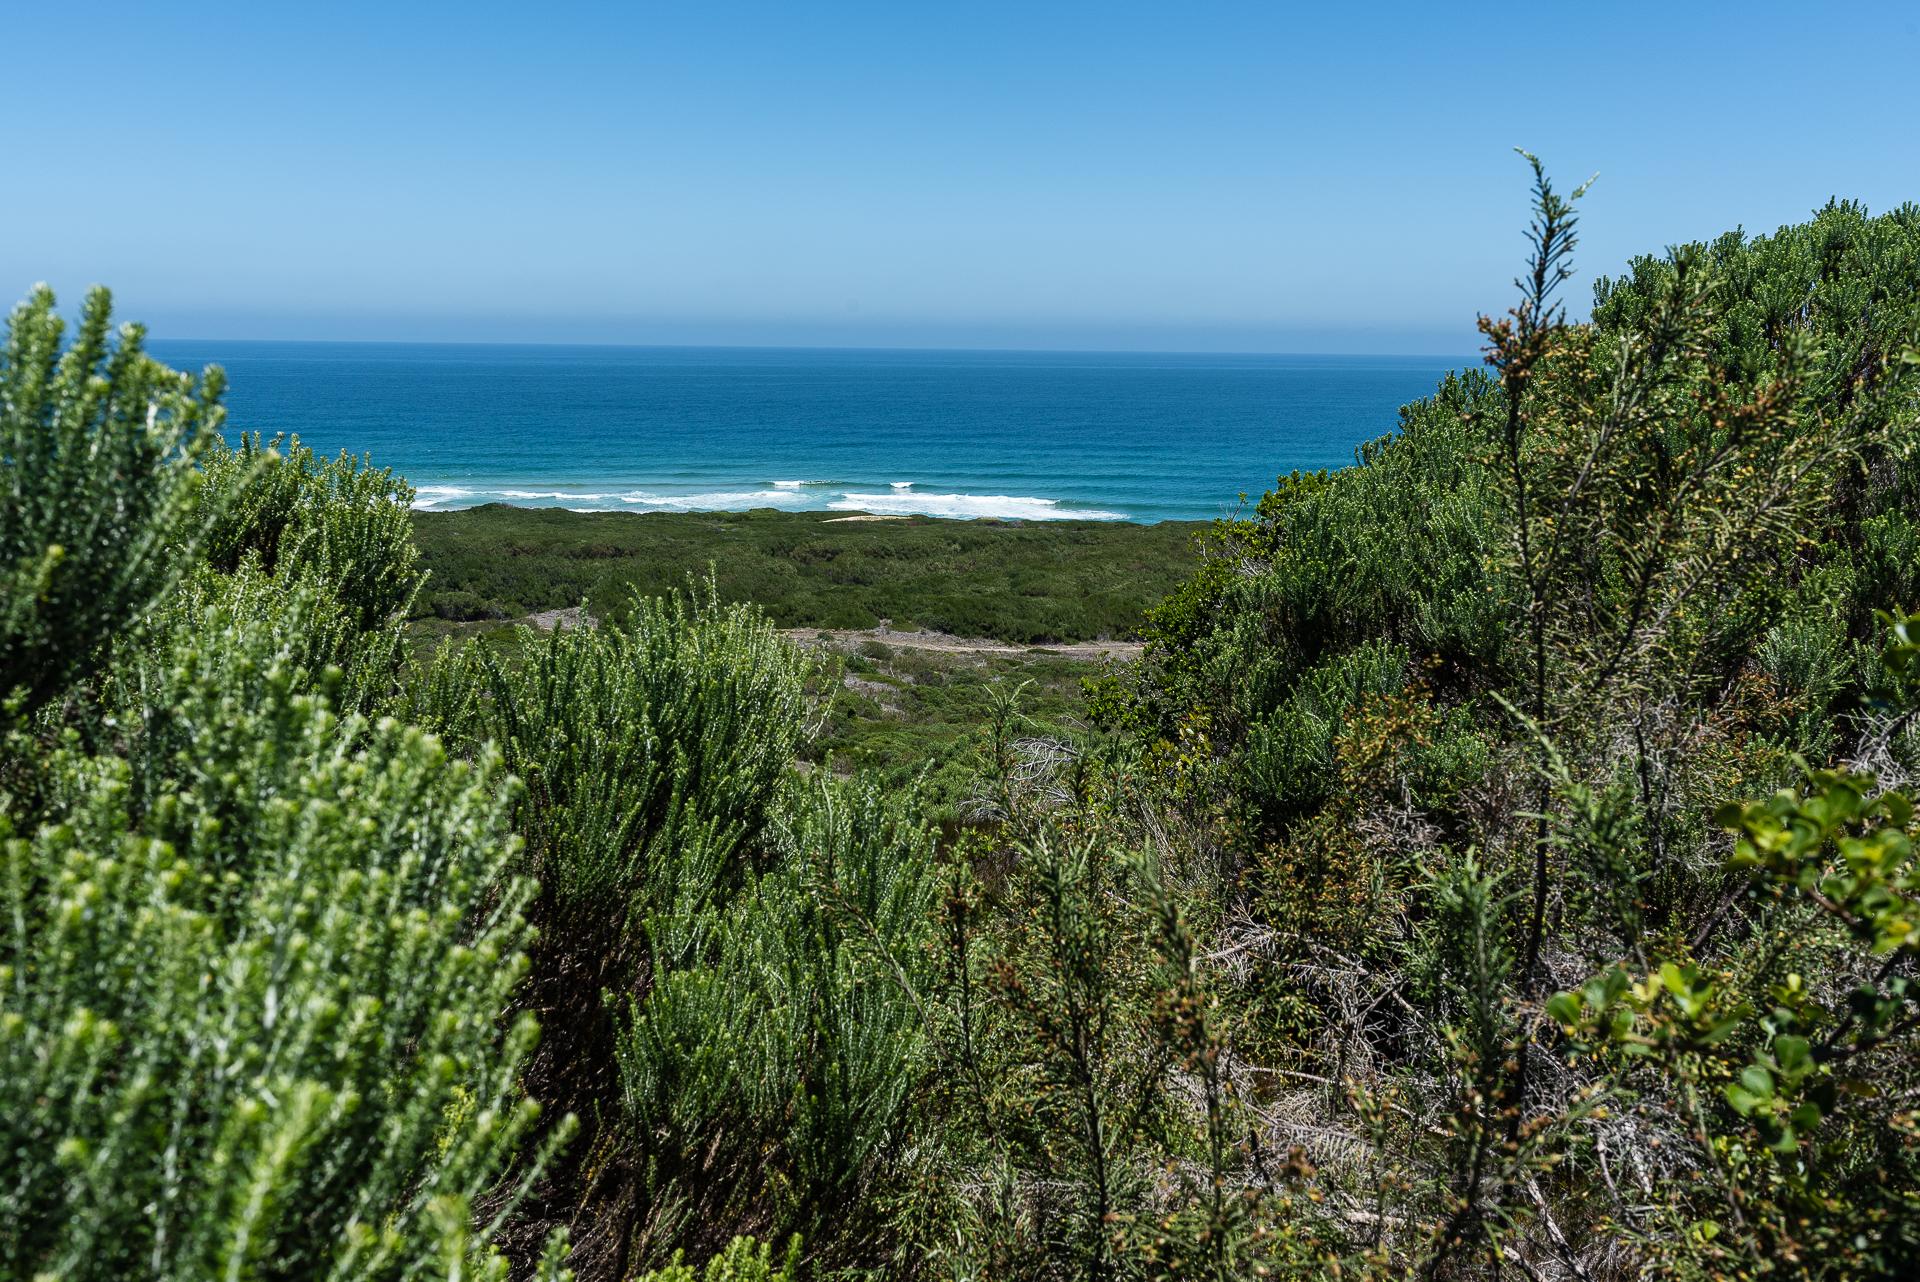 Goukamma Nature Reserve, South Africa